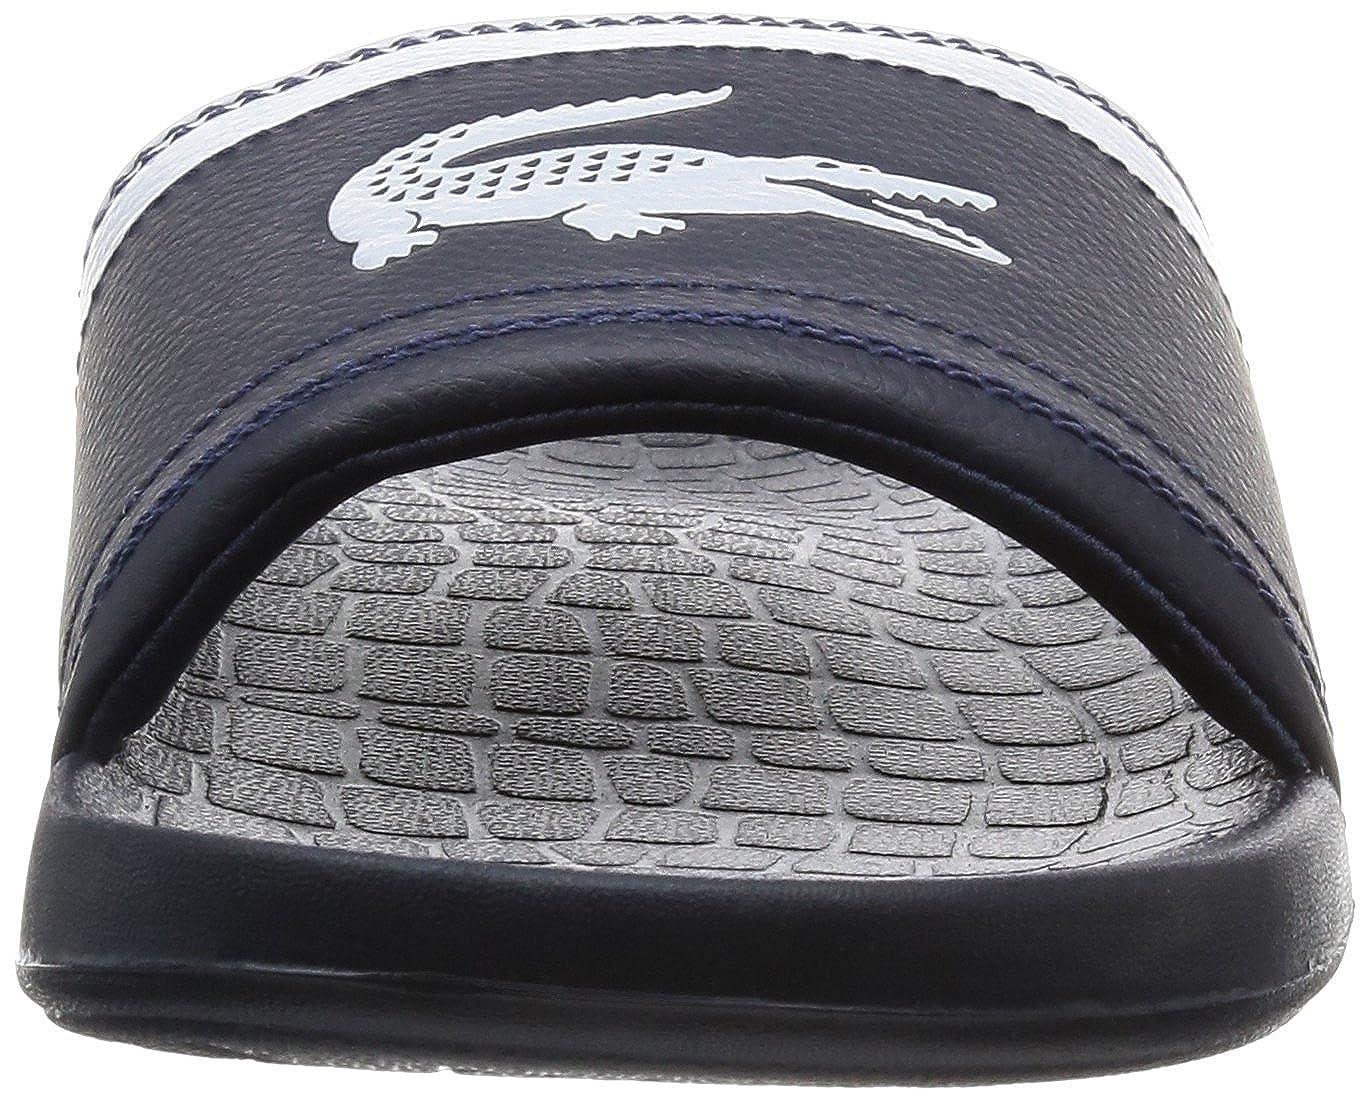 90cc07796c43a7 Amazon.com  Lacoste Men s Fraisier BRD1 Leather Synthetic Slip On Slide  Dark Blue-Navy-7  Clothing